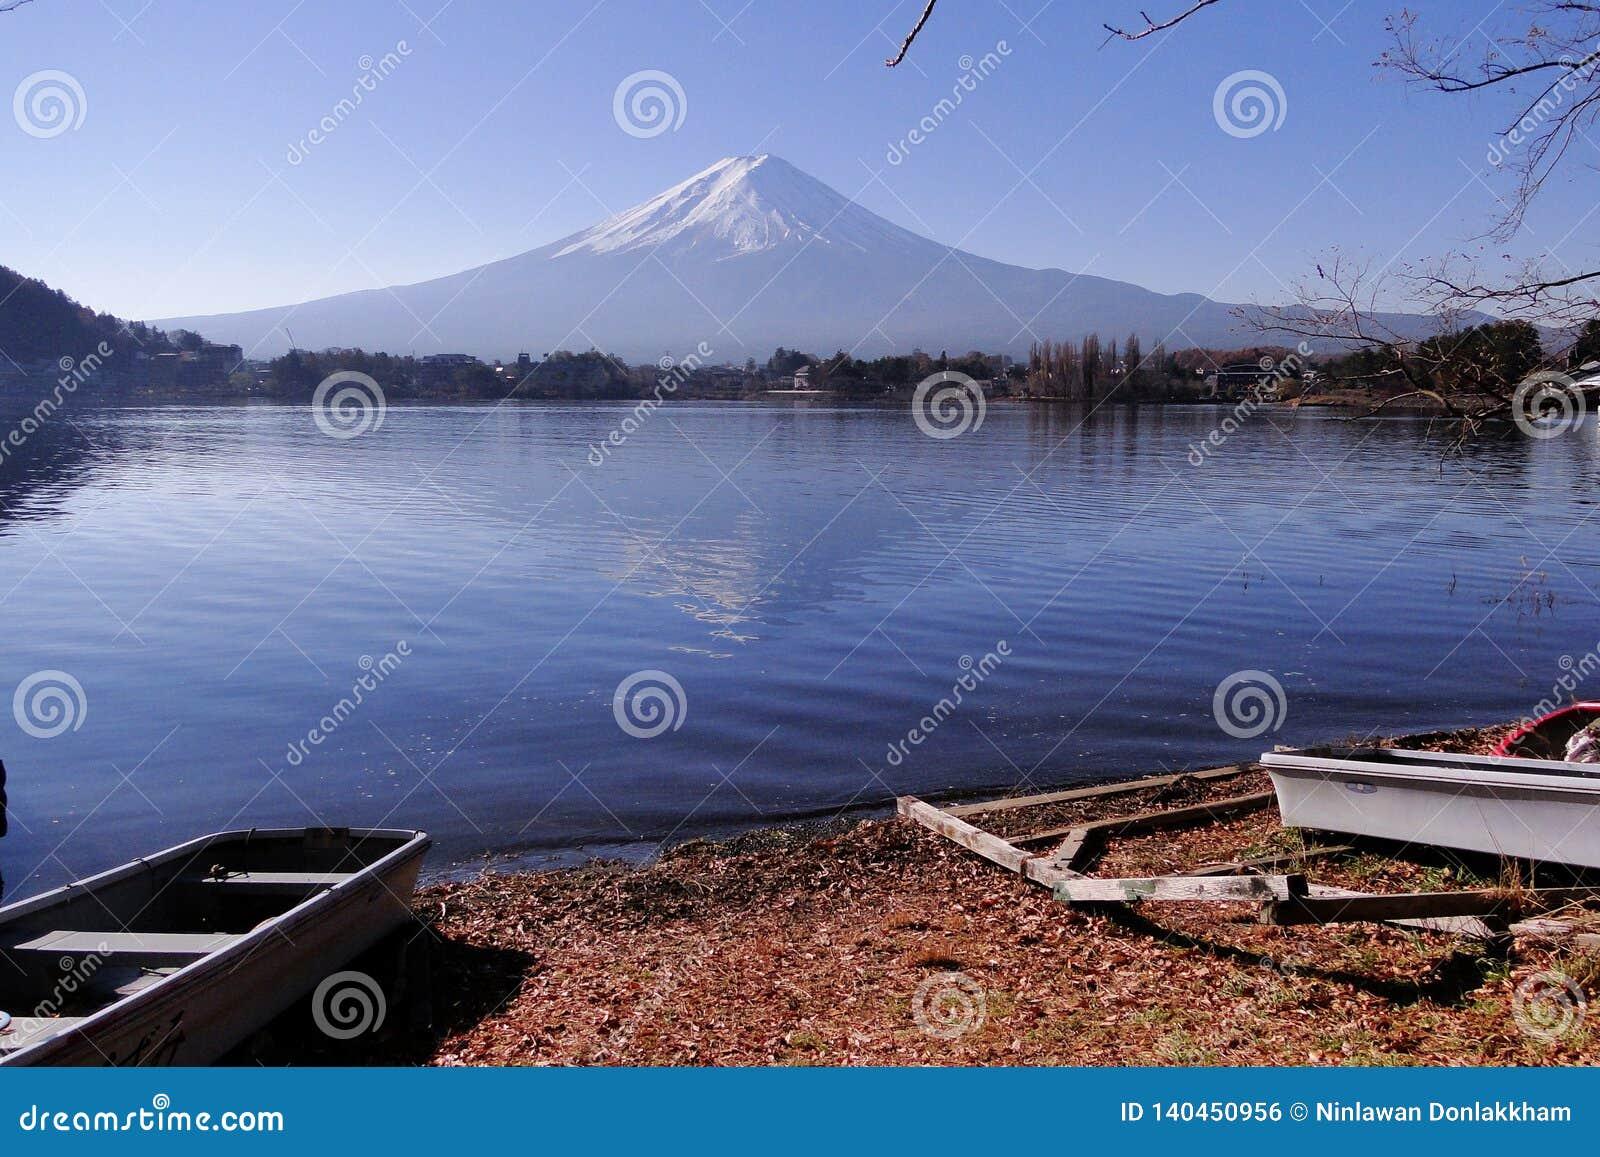 Mount Fuji - an iconic of Japan